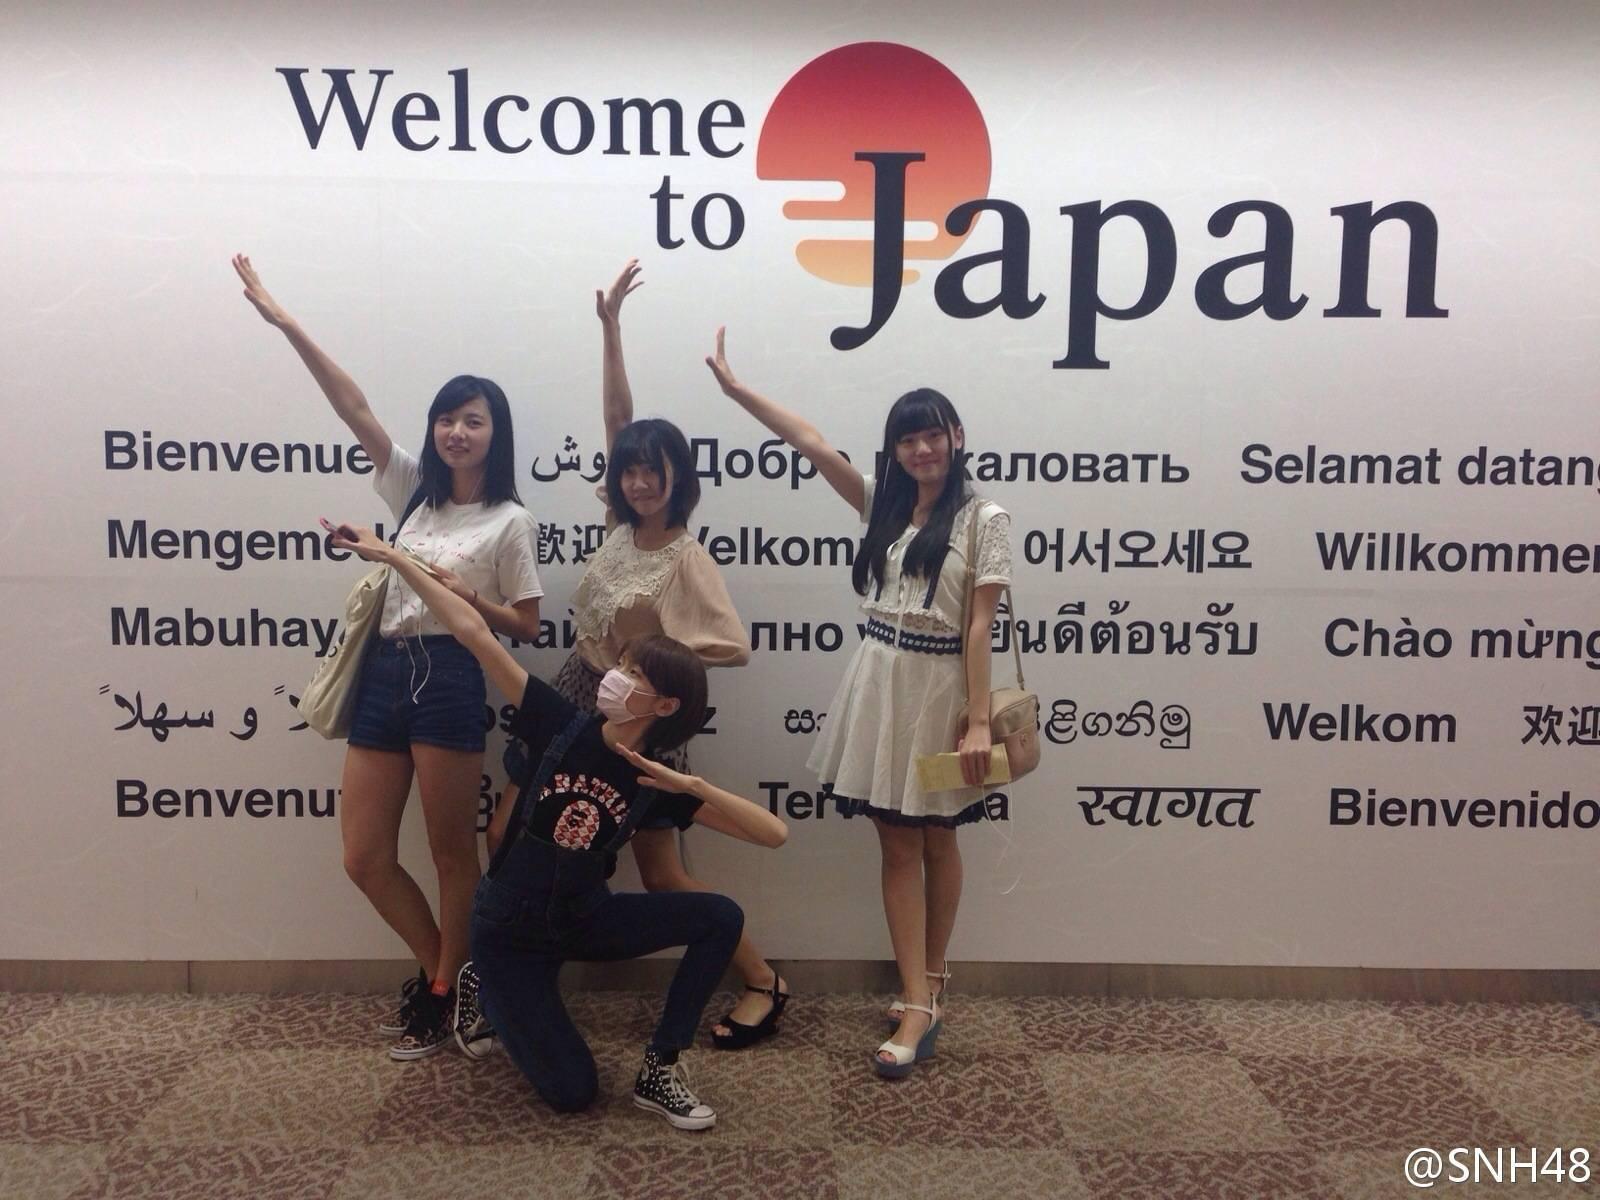 【SNH48】馮薪朵(ナナシ)、陸婷(LISA)、萬麗娜(Nana)、趙粵(YUMI)がドームコンサートへ来日!